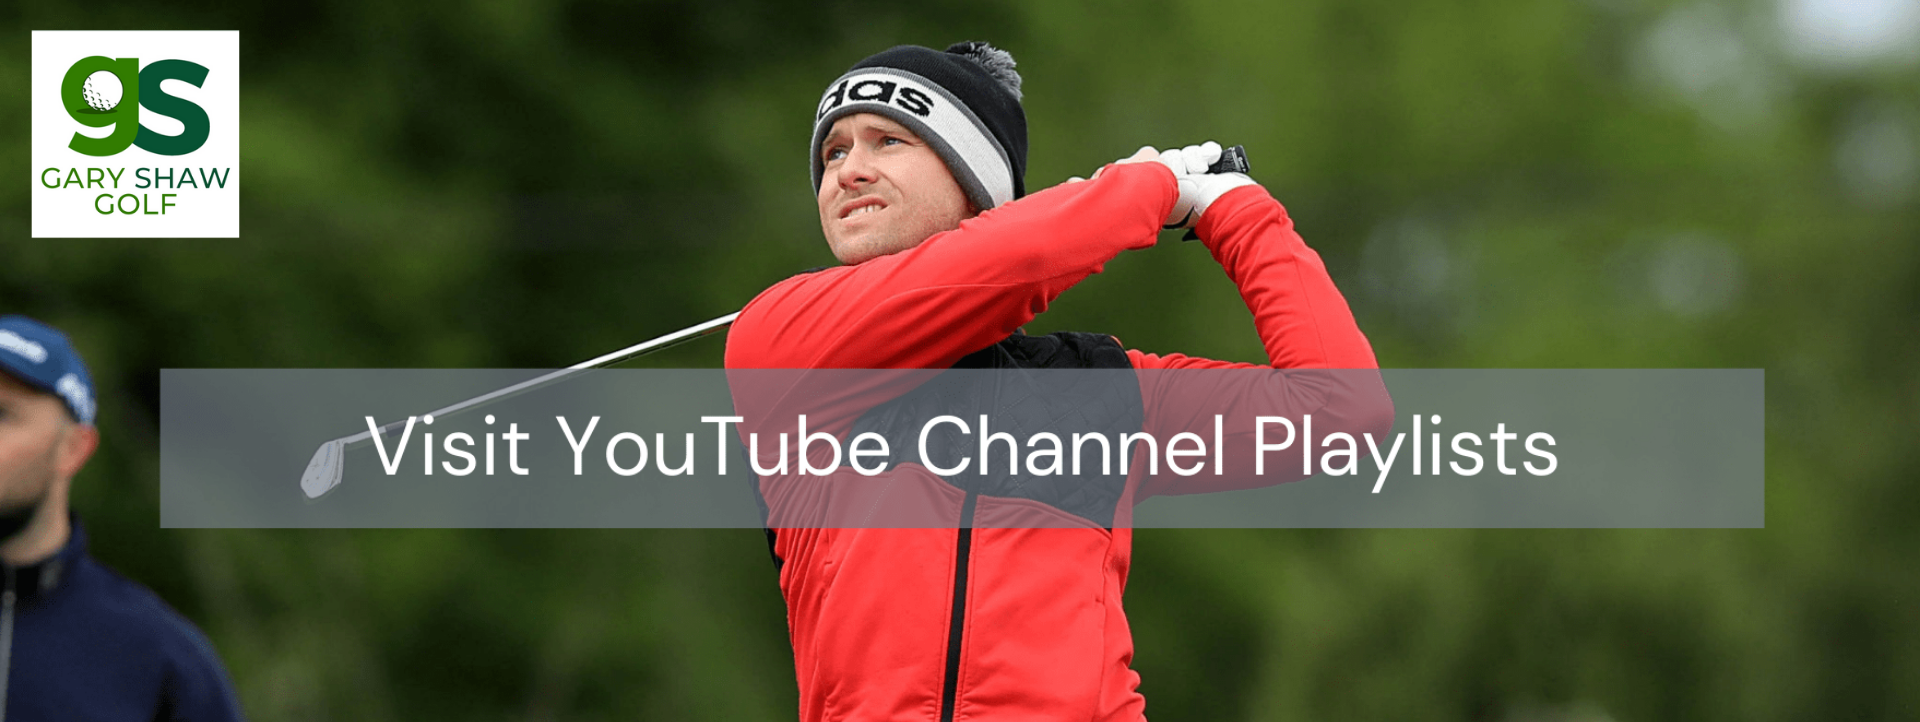 Gary Shaw Golf YouTube